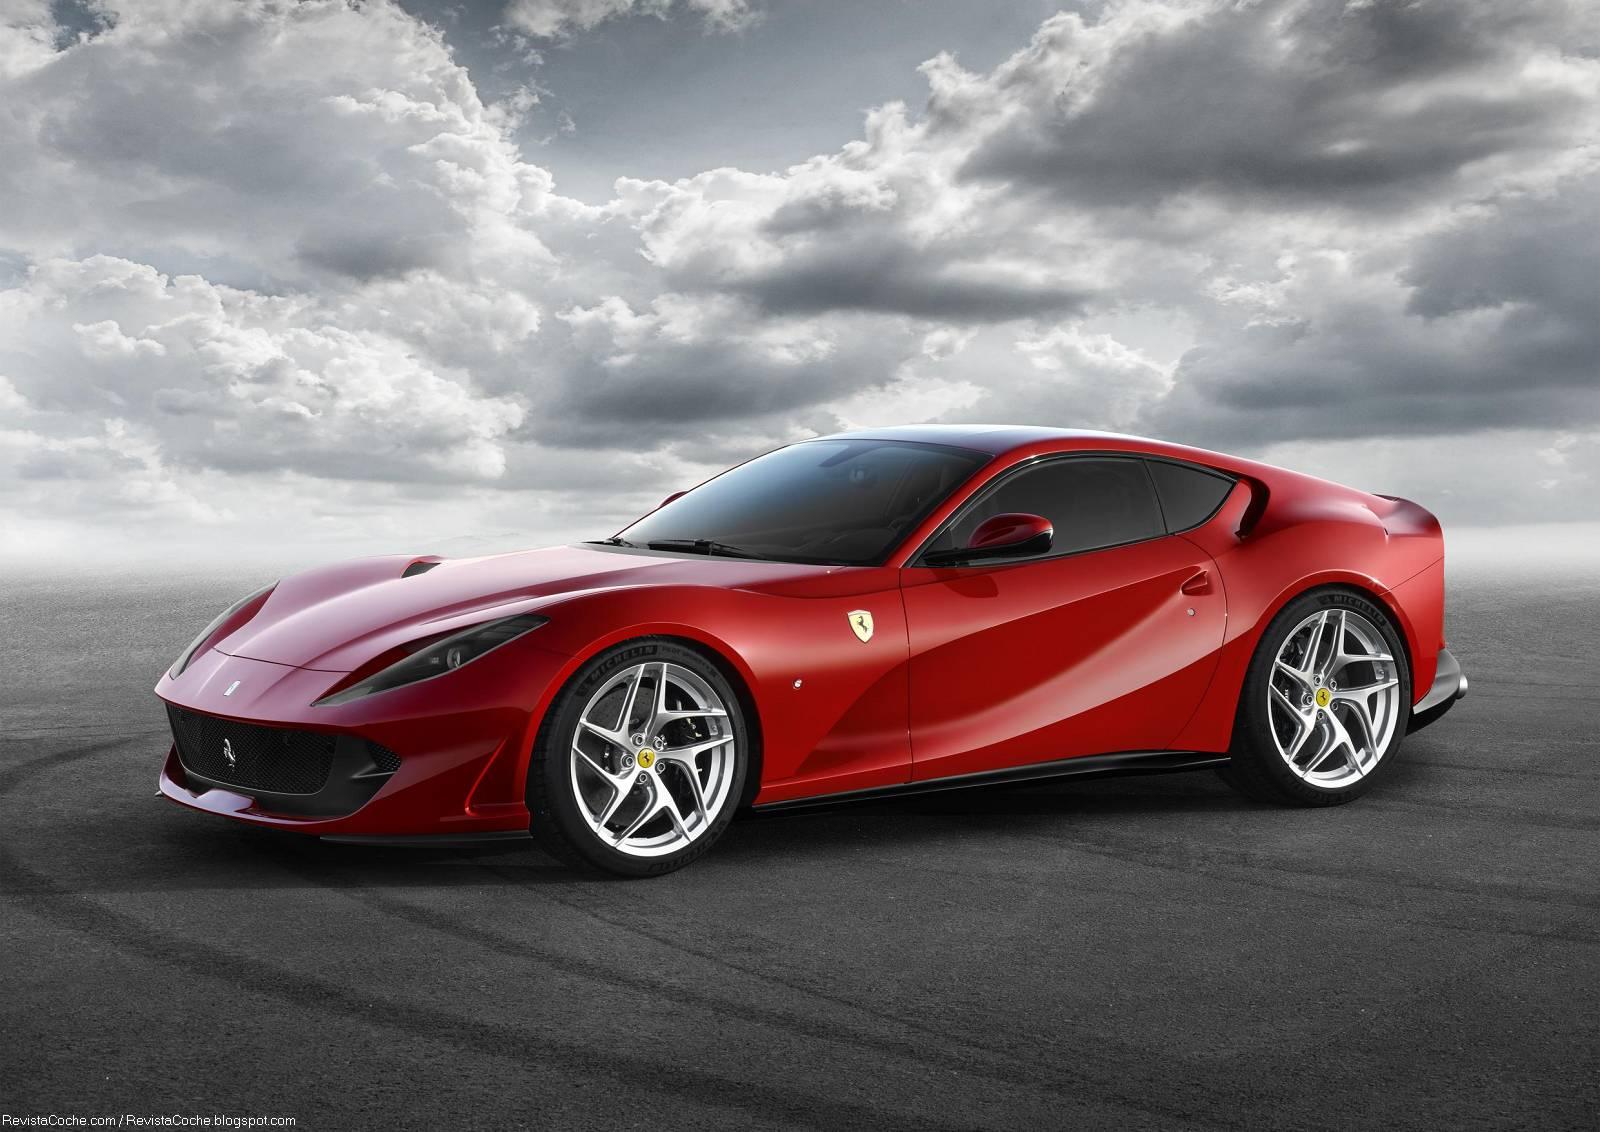 Fondo de Ferrari Rojo Impresionante en Fondos y Pantallas